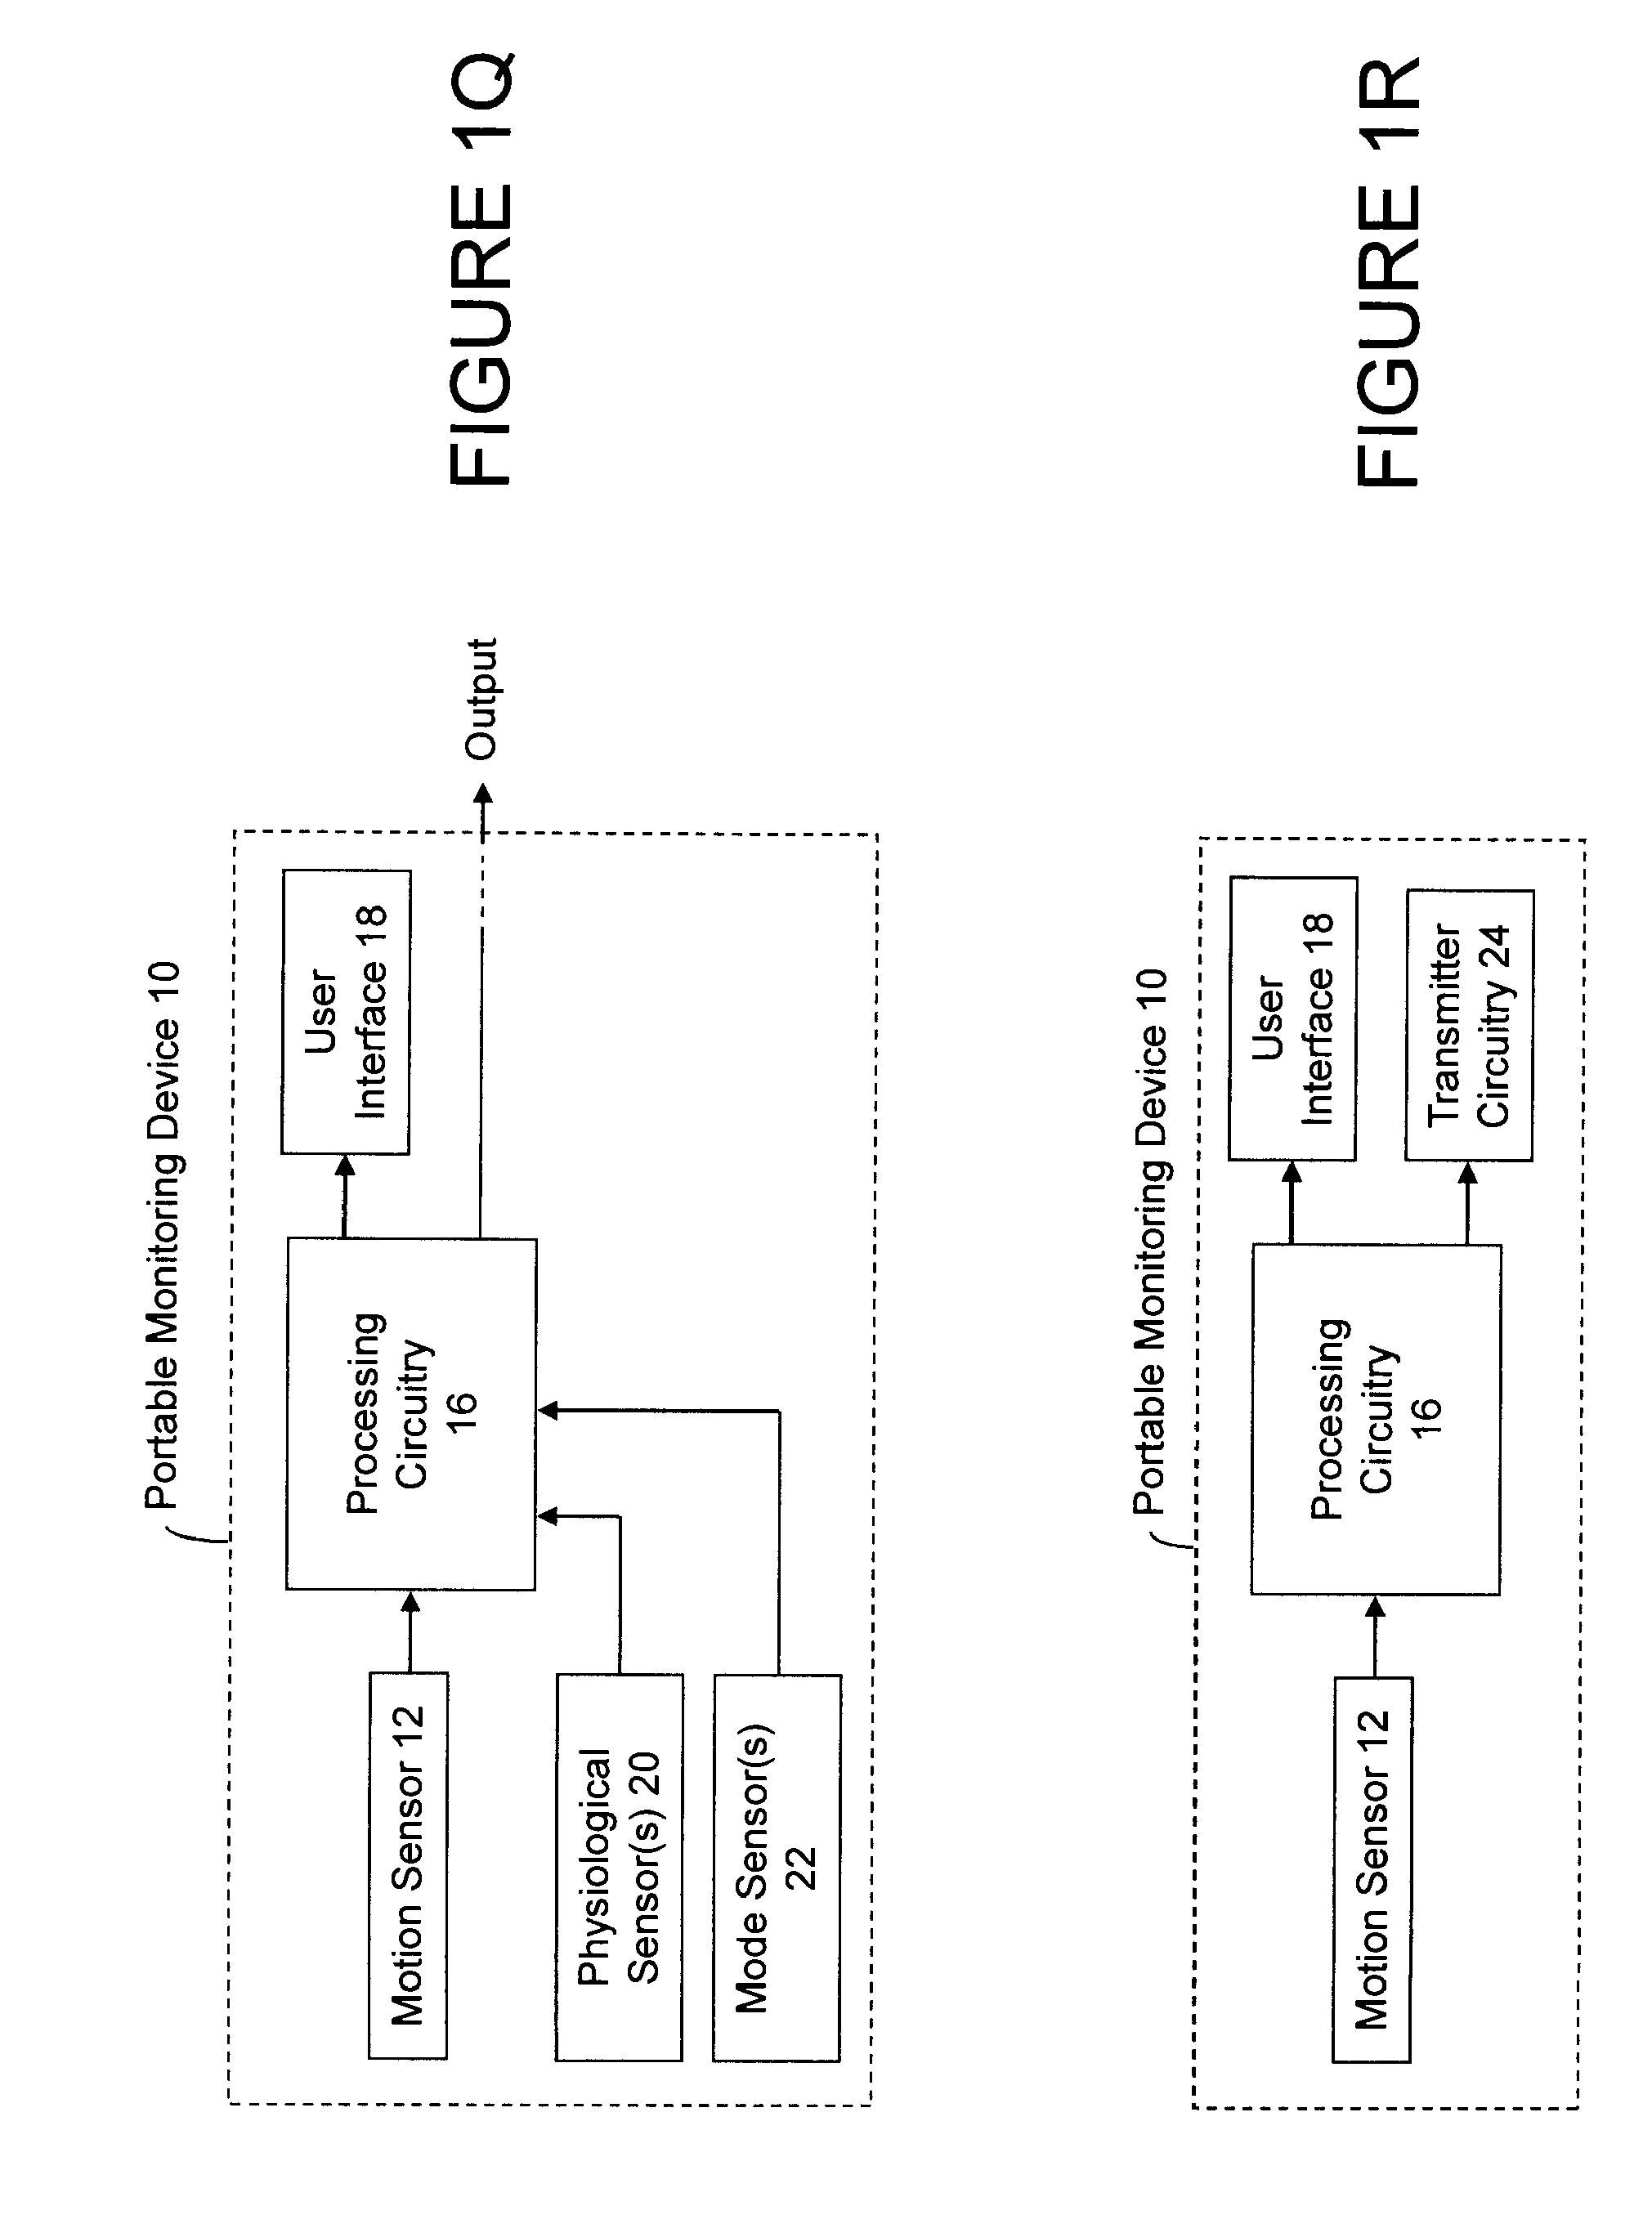 Patent US 8,583,402 B2